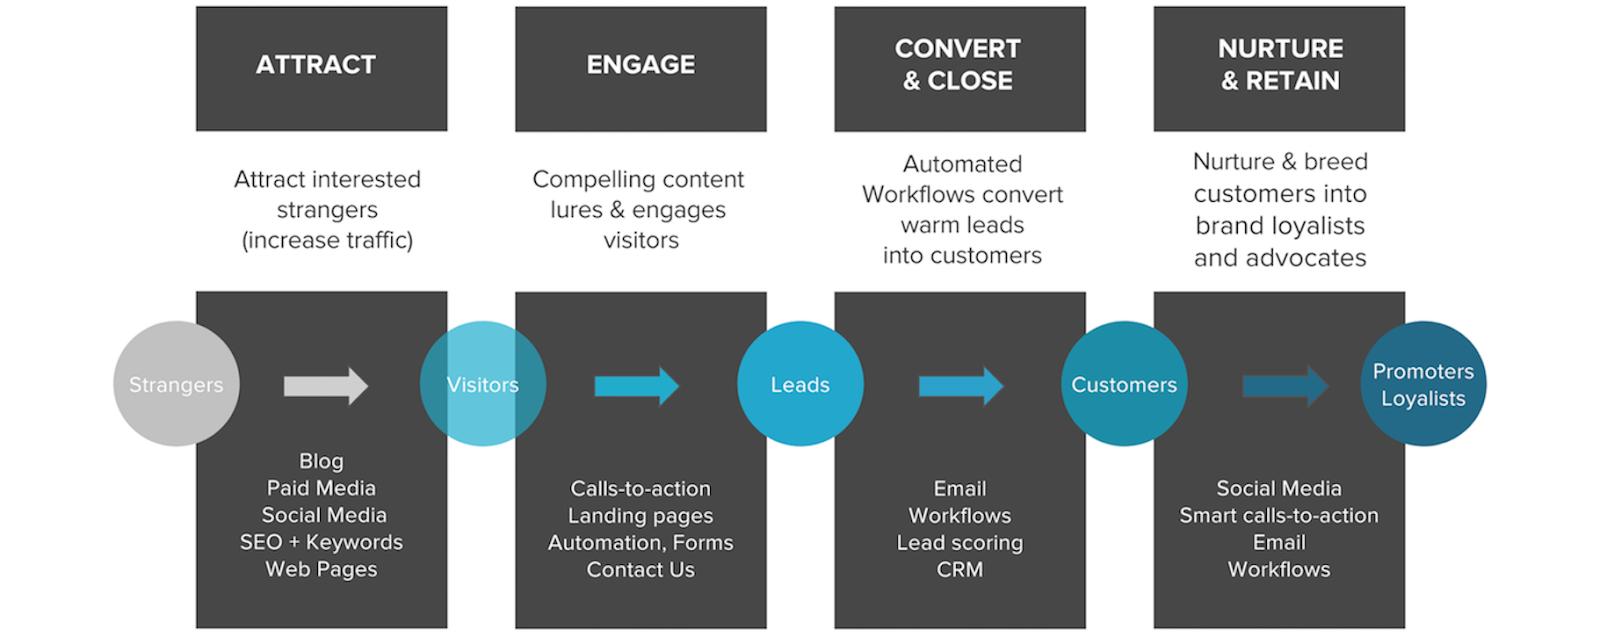 Lupo-digital-Inbound-marketing-journey-stages.png